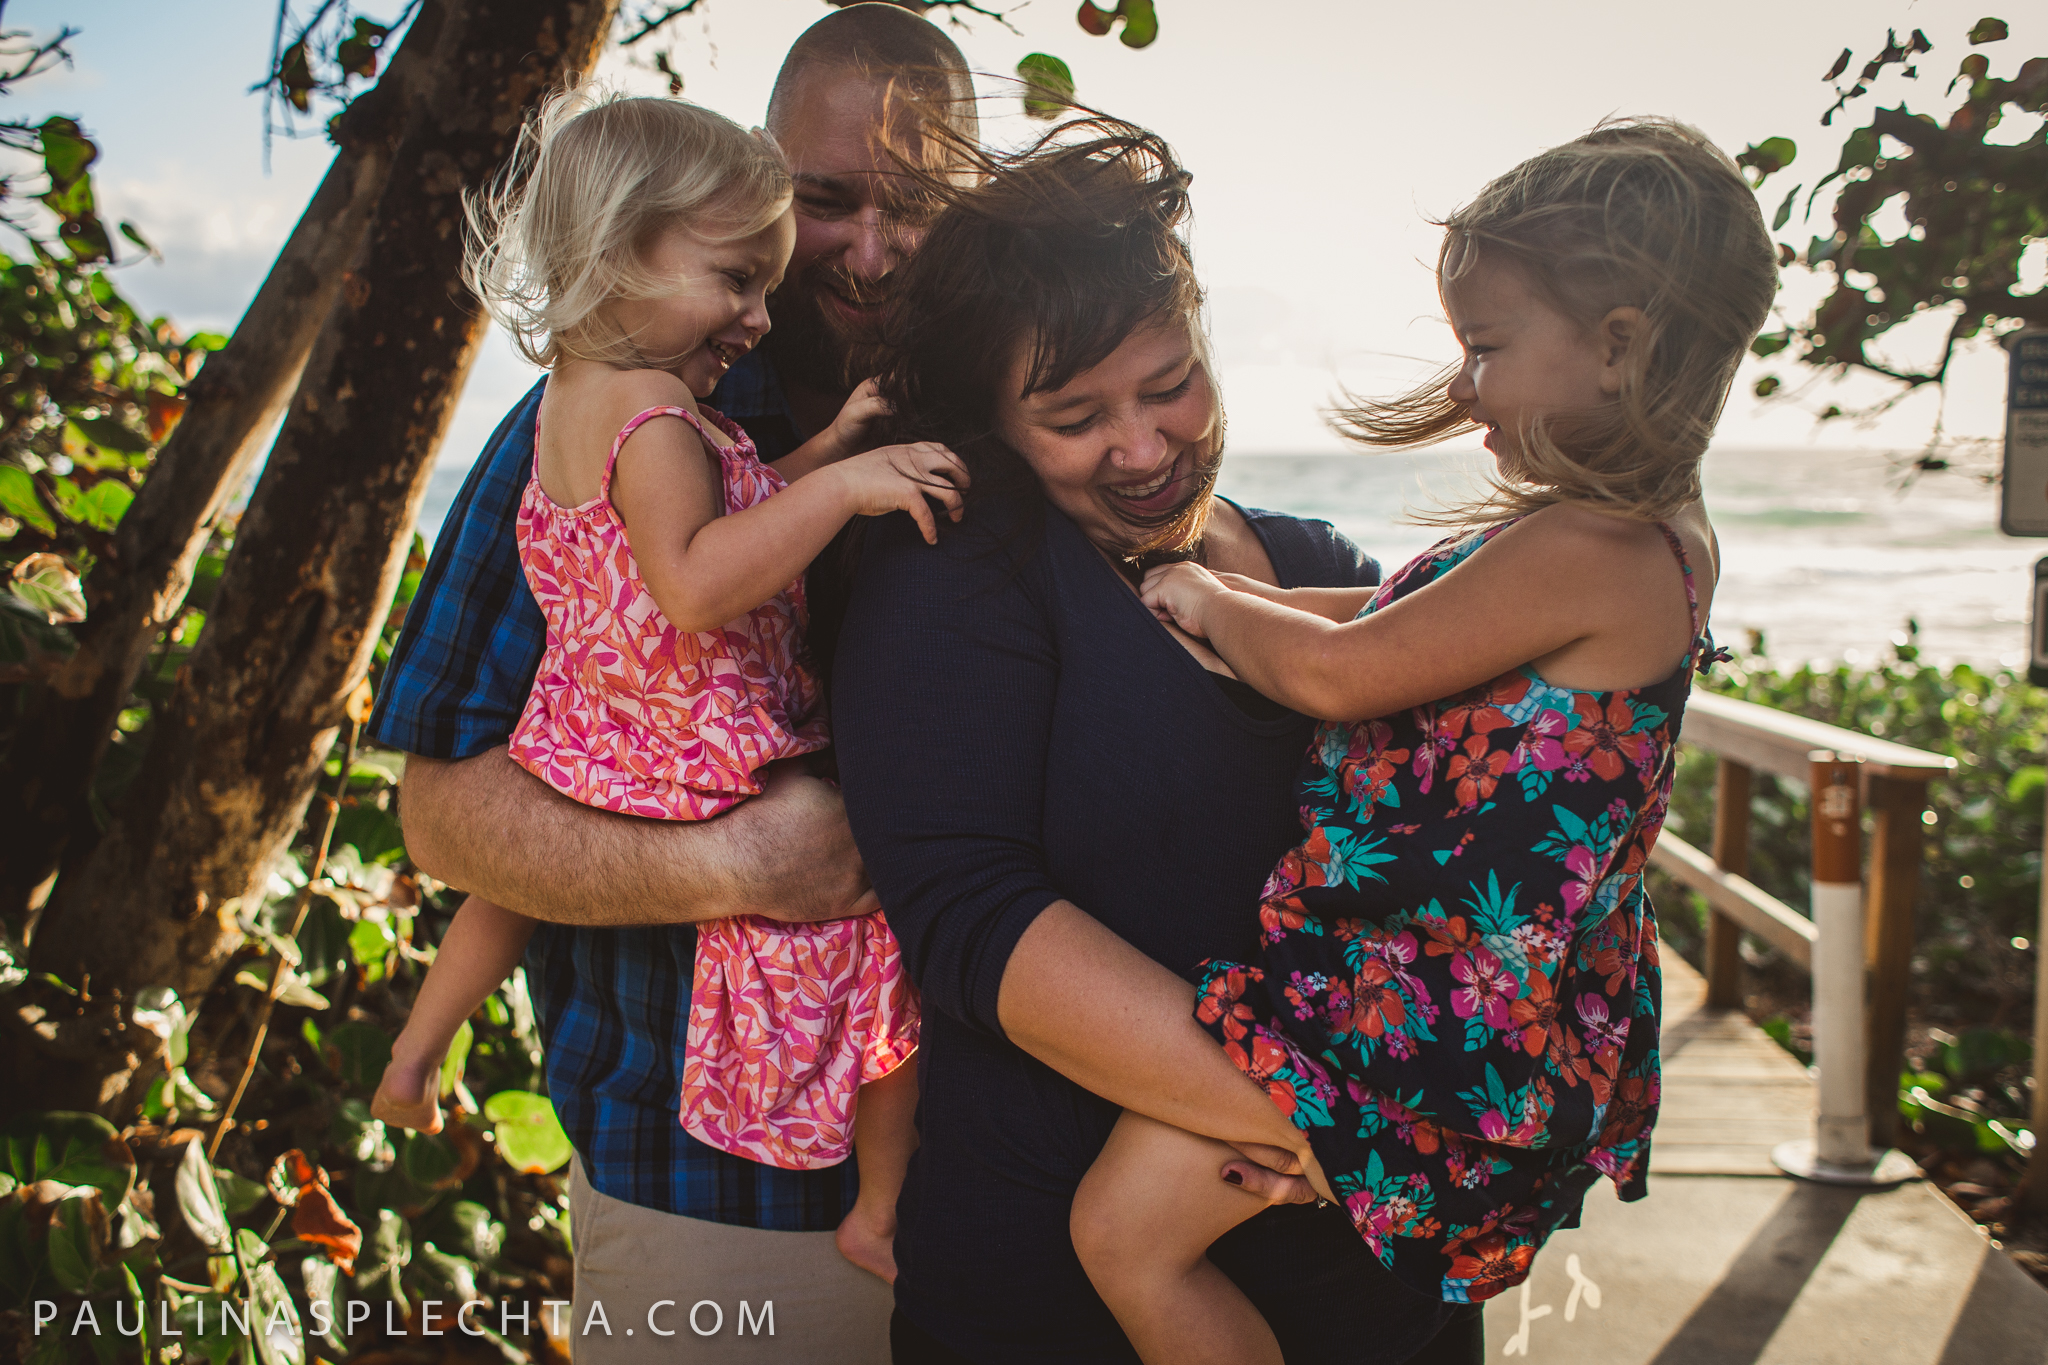 Family Photographer South Florida Pompano Broward Palm Beach Babies Baby Newborn Breastfeeding Birth Photograpy Beach Home Documentary Session-59.jpg